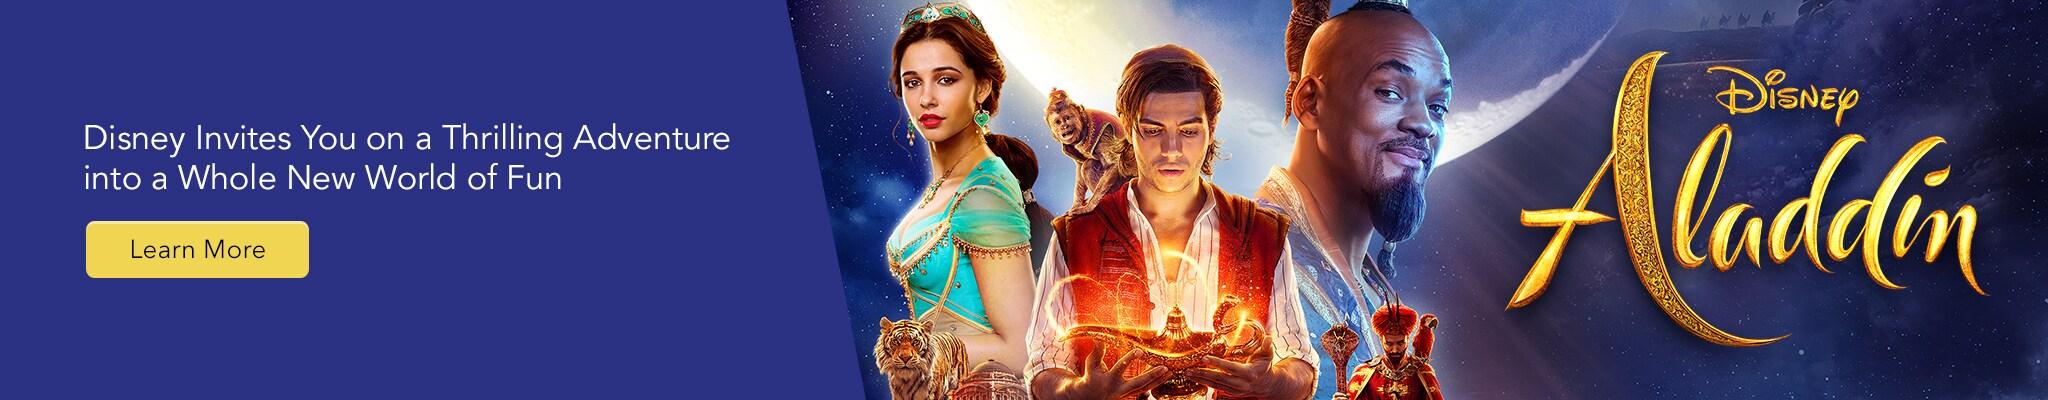 Disney Aladdin. Disney Invites You on a Thrilling Adventure into a Whole New World of Fun.